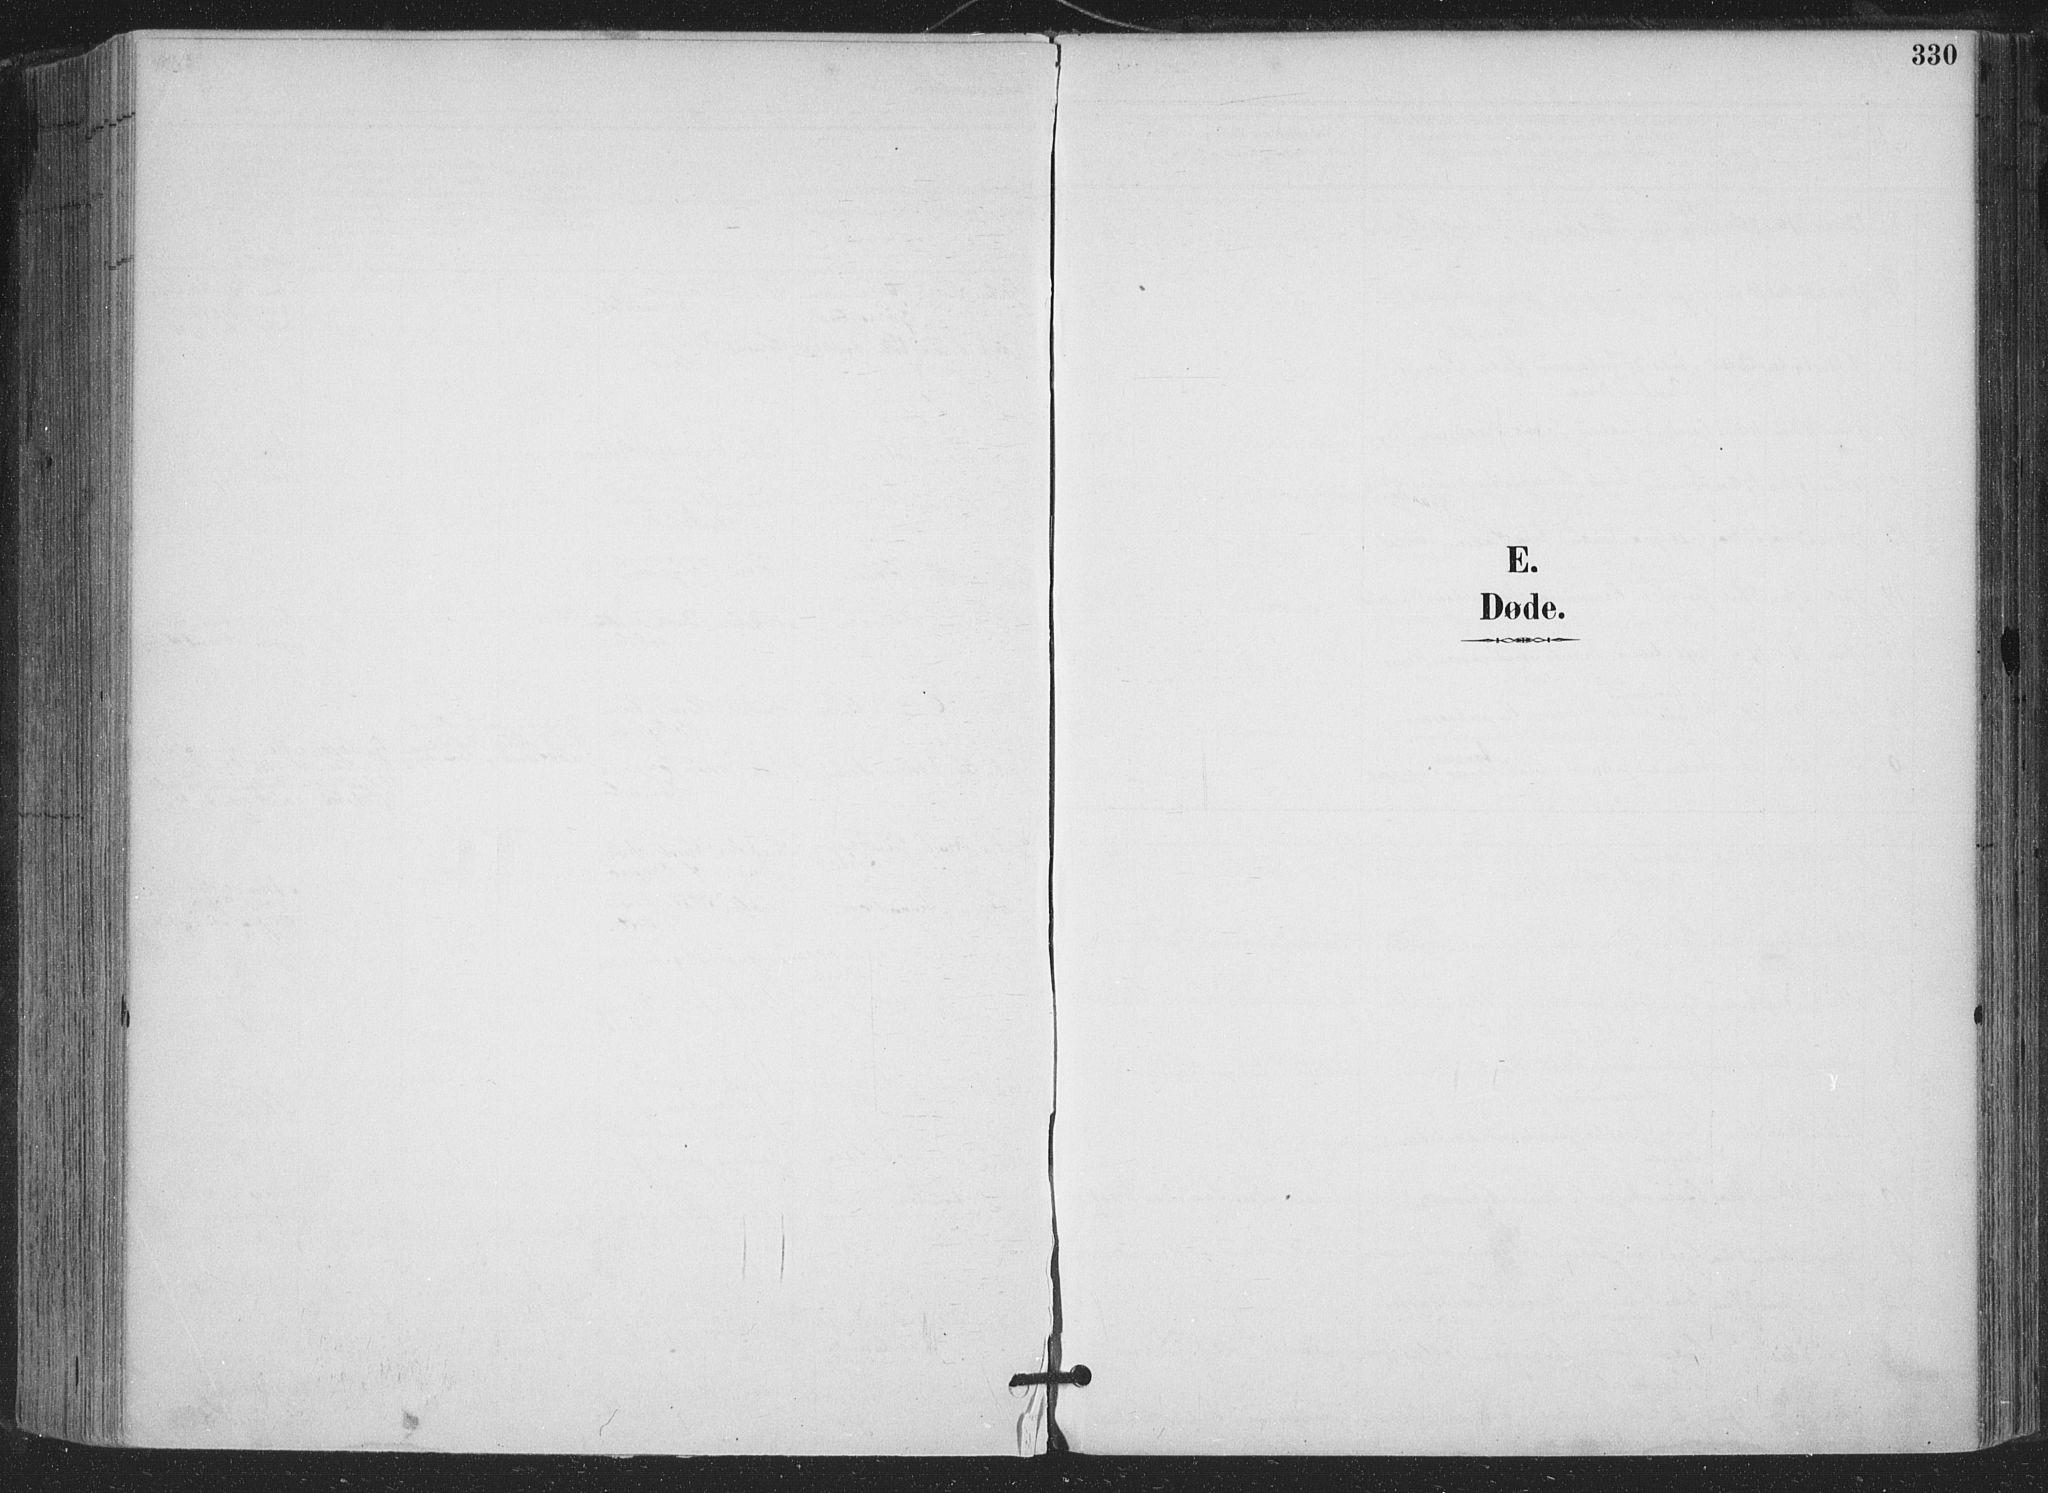 SAKO, Bamble kirkebøker, F/Fa/L0008: Ministerialbok nr. I 8, 1888-1900, s. 330